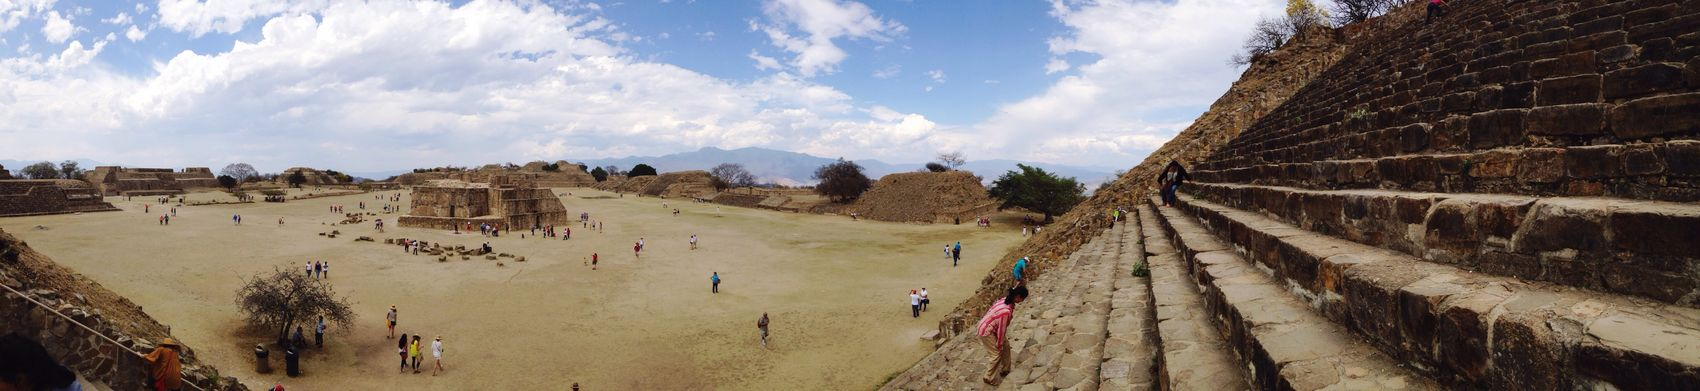 MonteAlban Oaxaca México  ArcheologicSite Panoramic